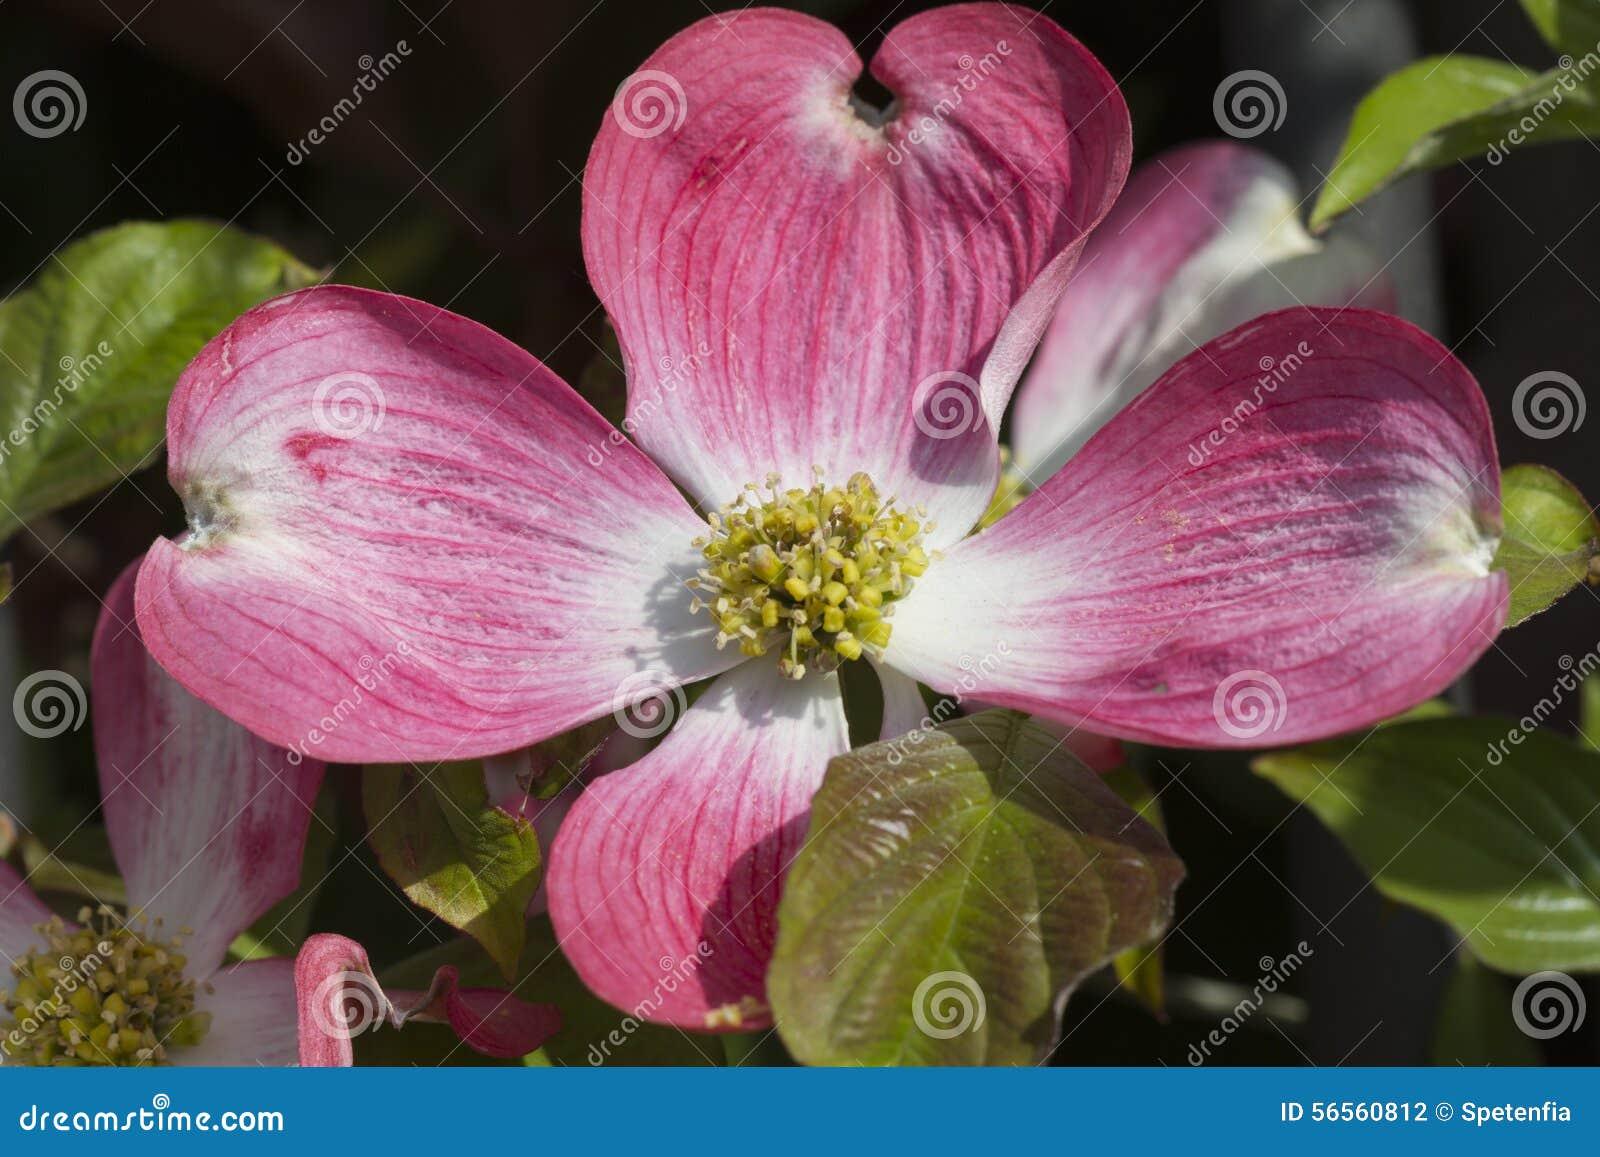 Download Λουλούδι Magnolia στο δέντρο Στοκ Εικόνες - εικόνα από άνοιξη, φύλλα: 56560812